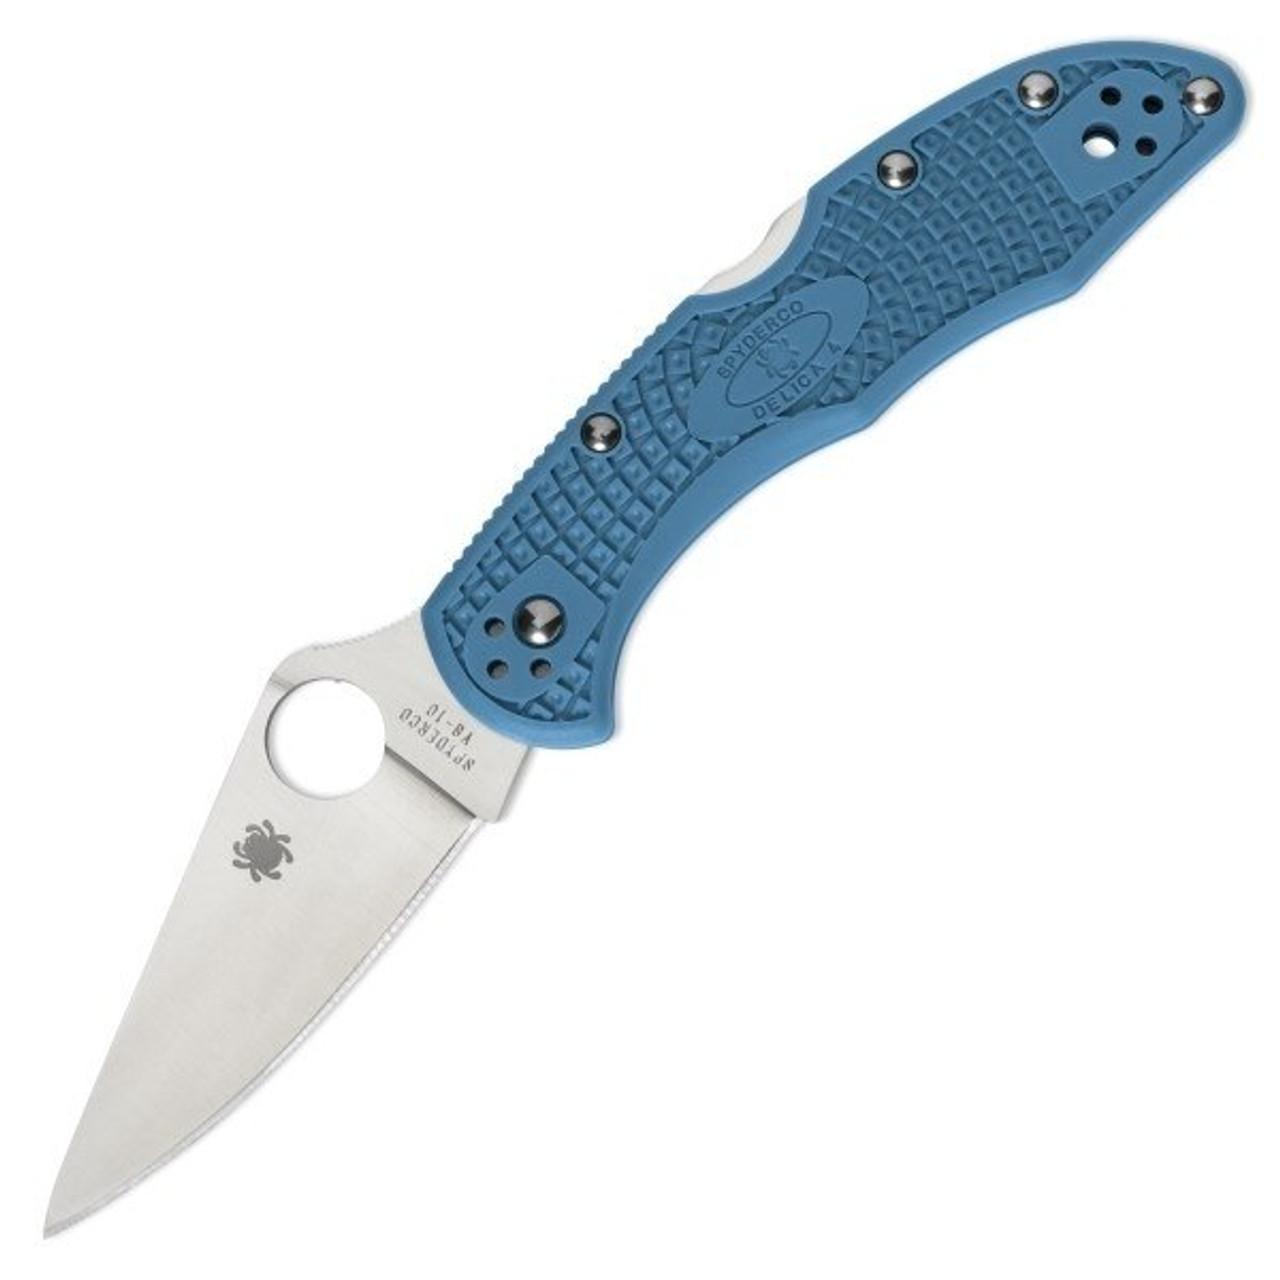 Spyderco Delica 4 Blue FG